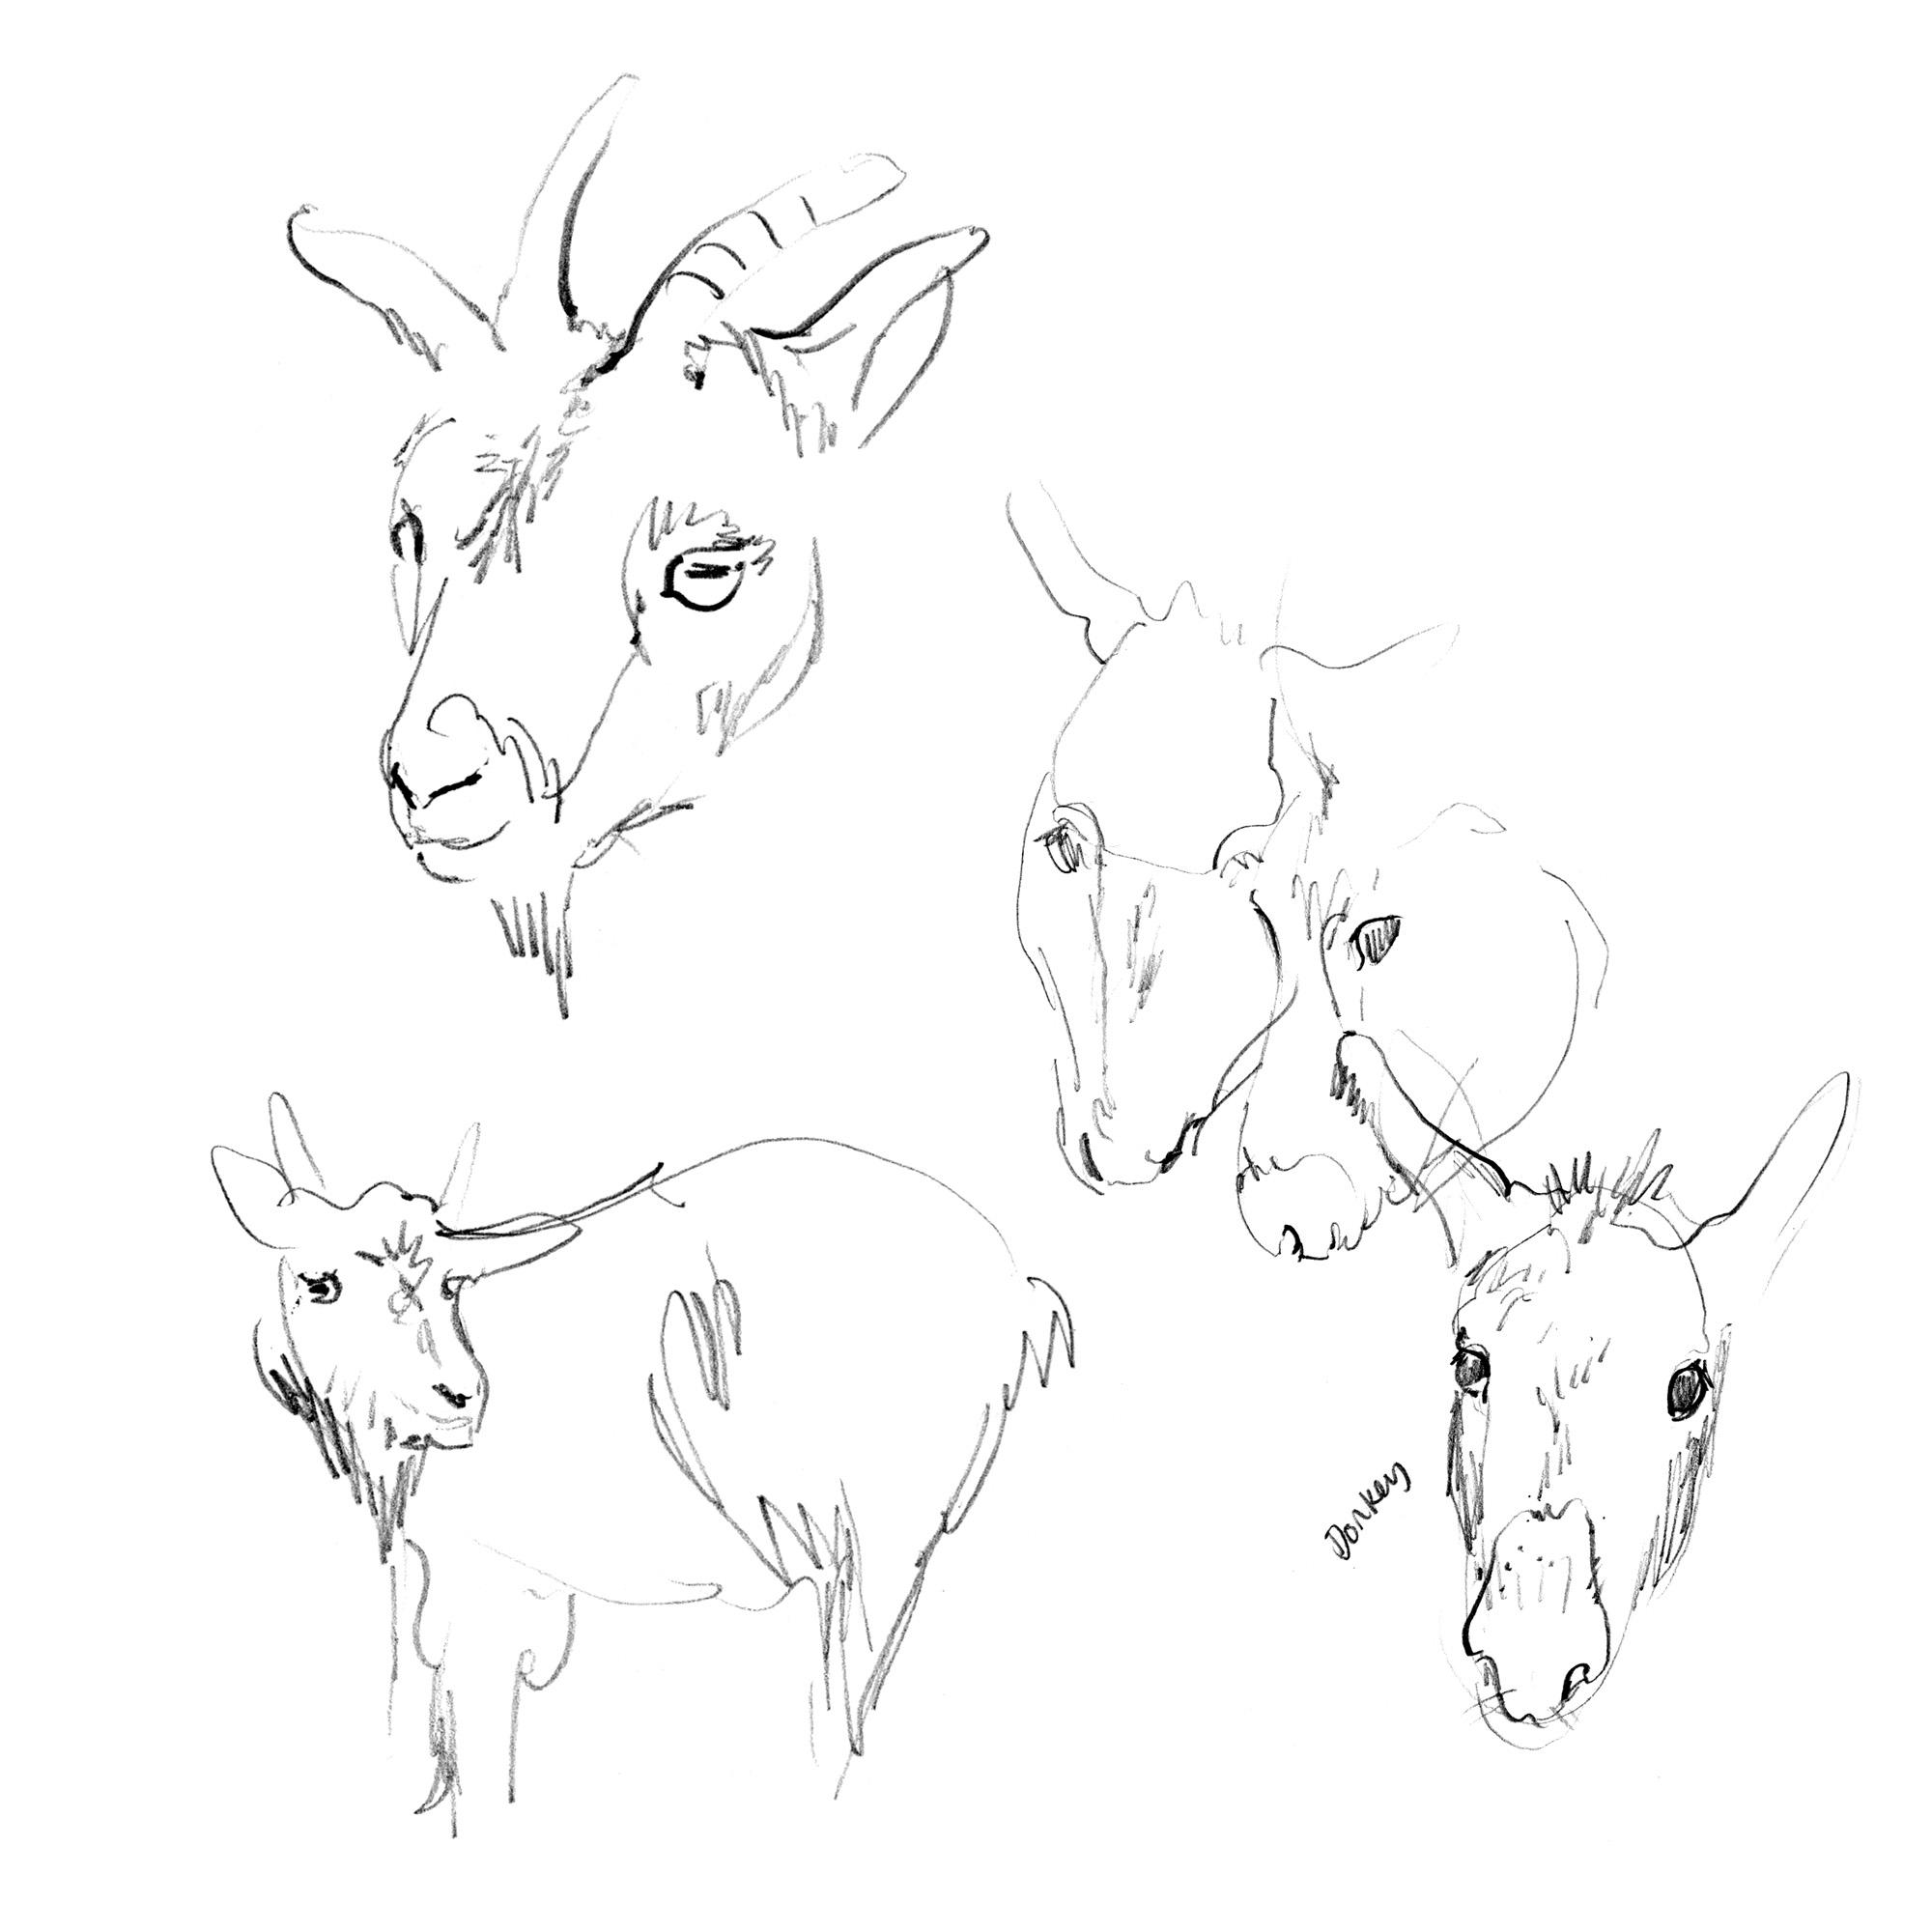 Goat&Donkey-Sketchbook_Sophia O'Connor.jpg